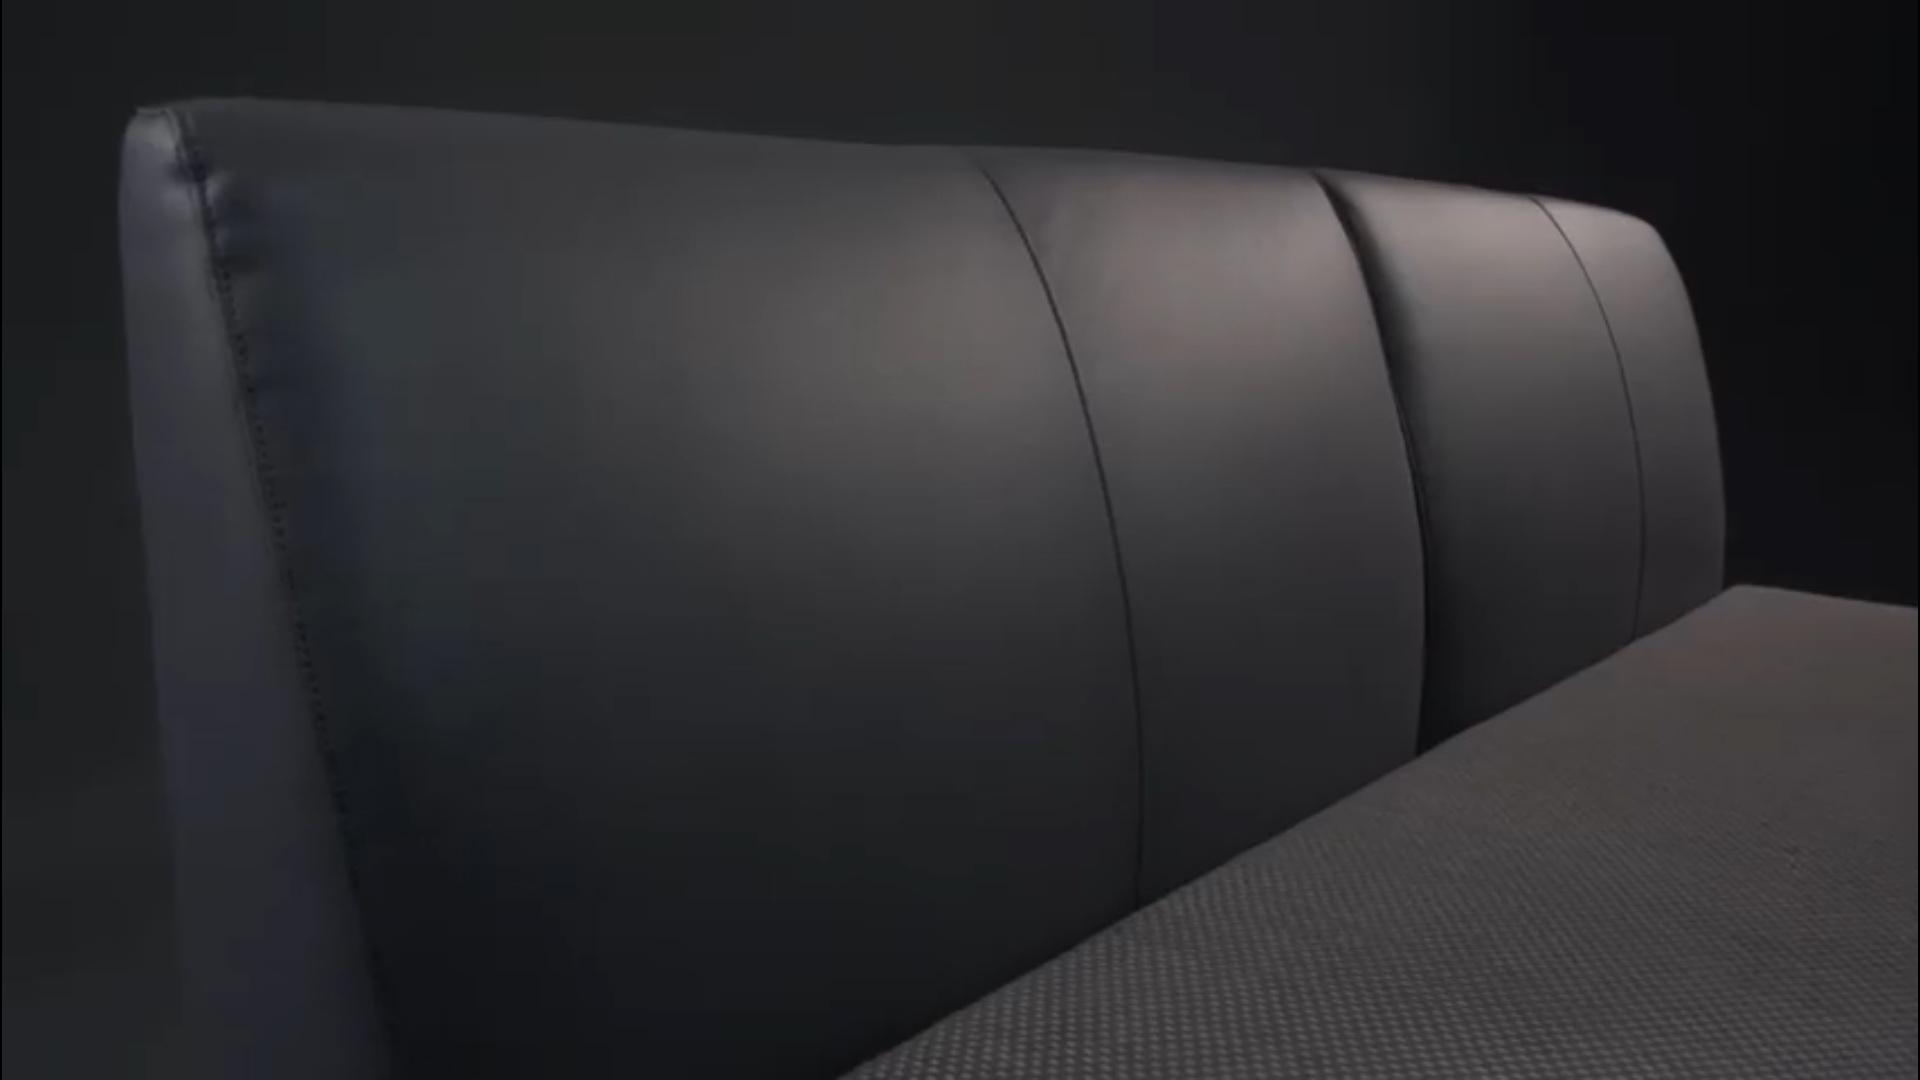 Xiaomi 8H Milan Smart Bed